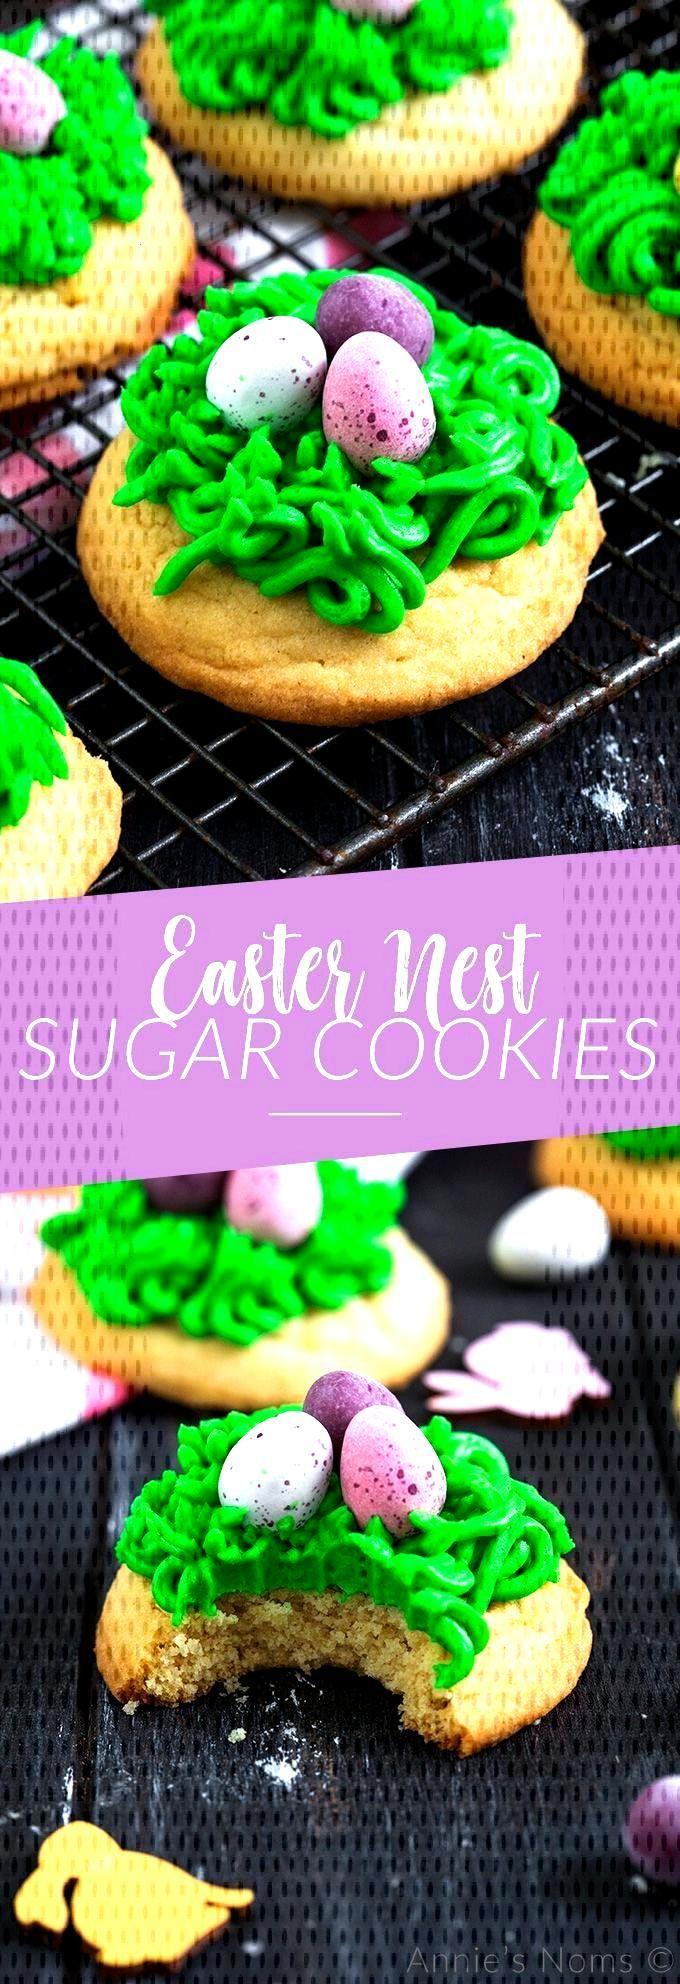 Easter Nest Sugar Cookies Easter Nest Sugar Cookies ,